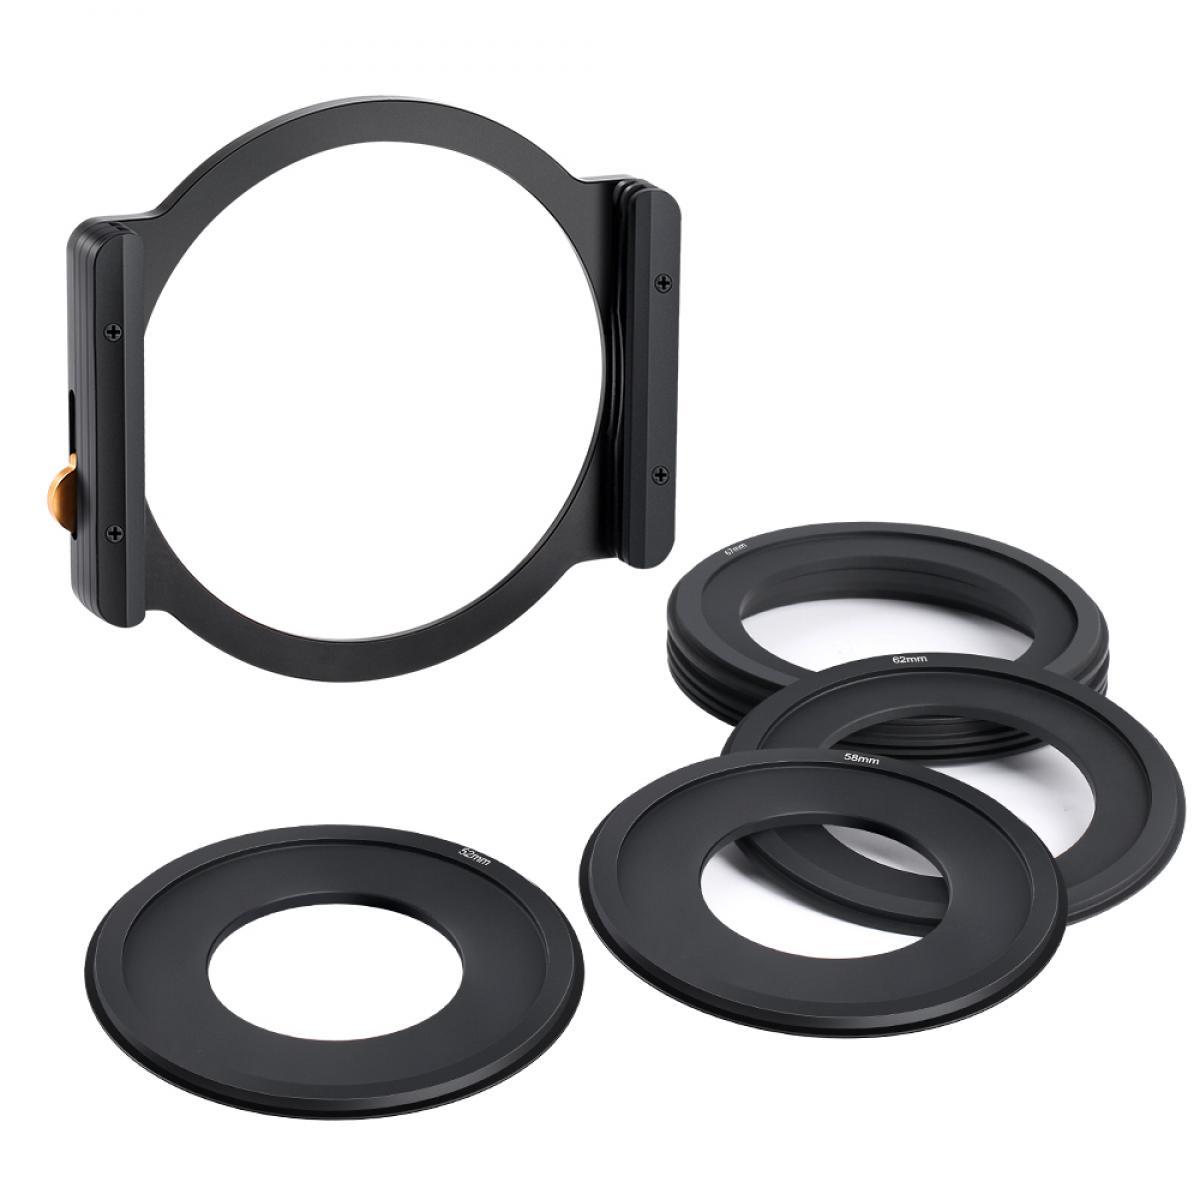 100 Square Filter Metal Holder + 8pcs Adapter Rings For DSLR